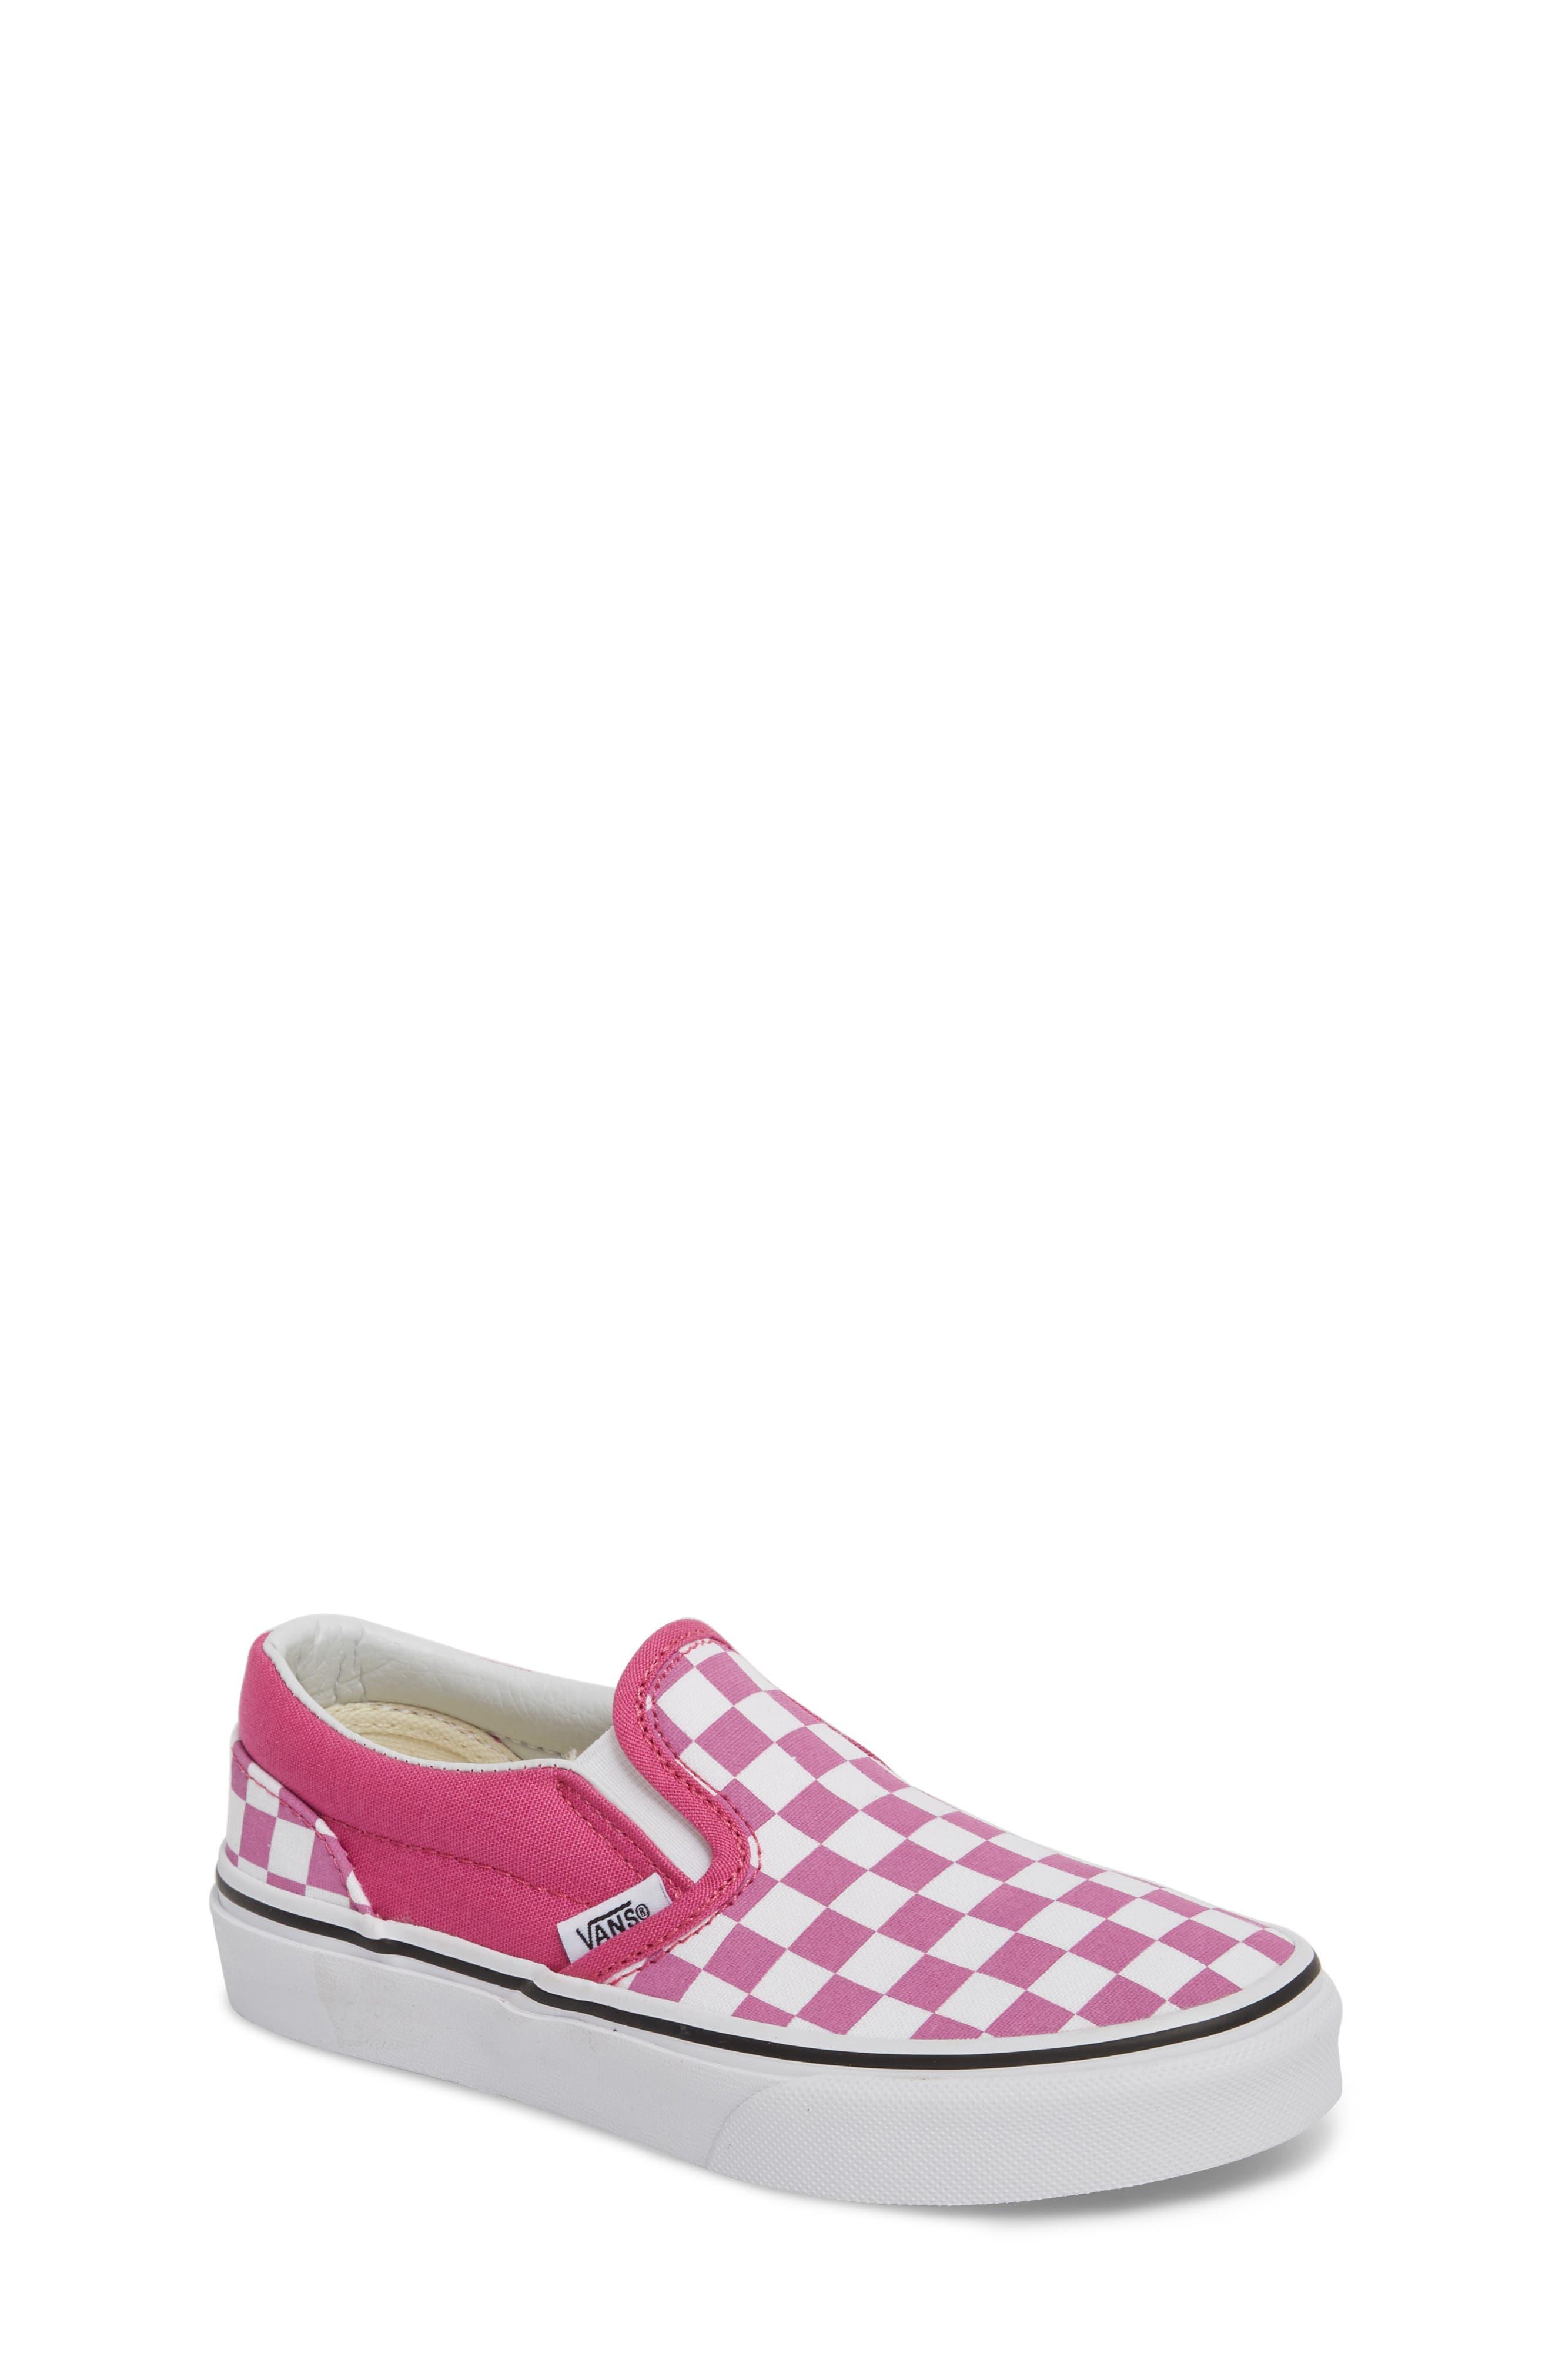 Vans 'Classic - Checkerboard' Slip-On (Toddler, Little Kid & Big Kid)